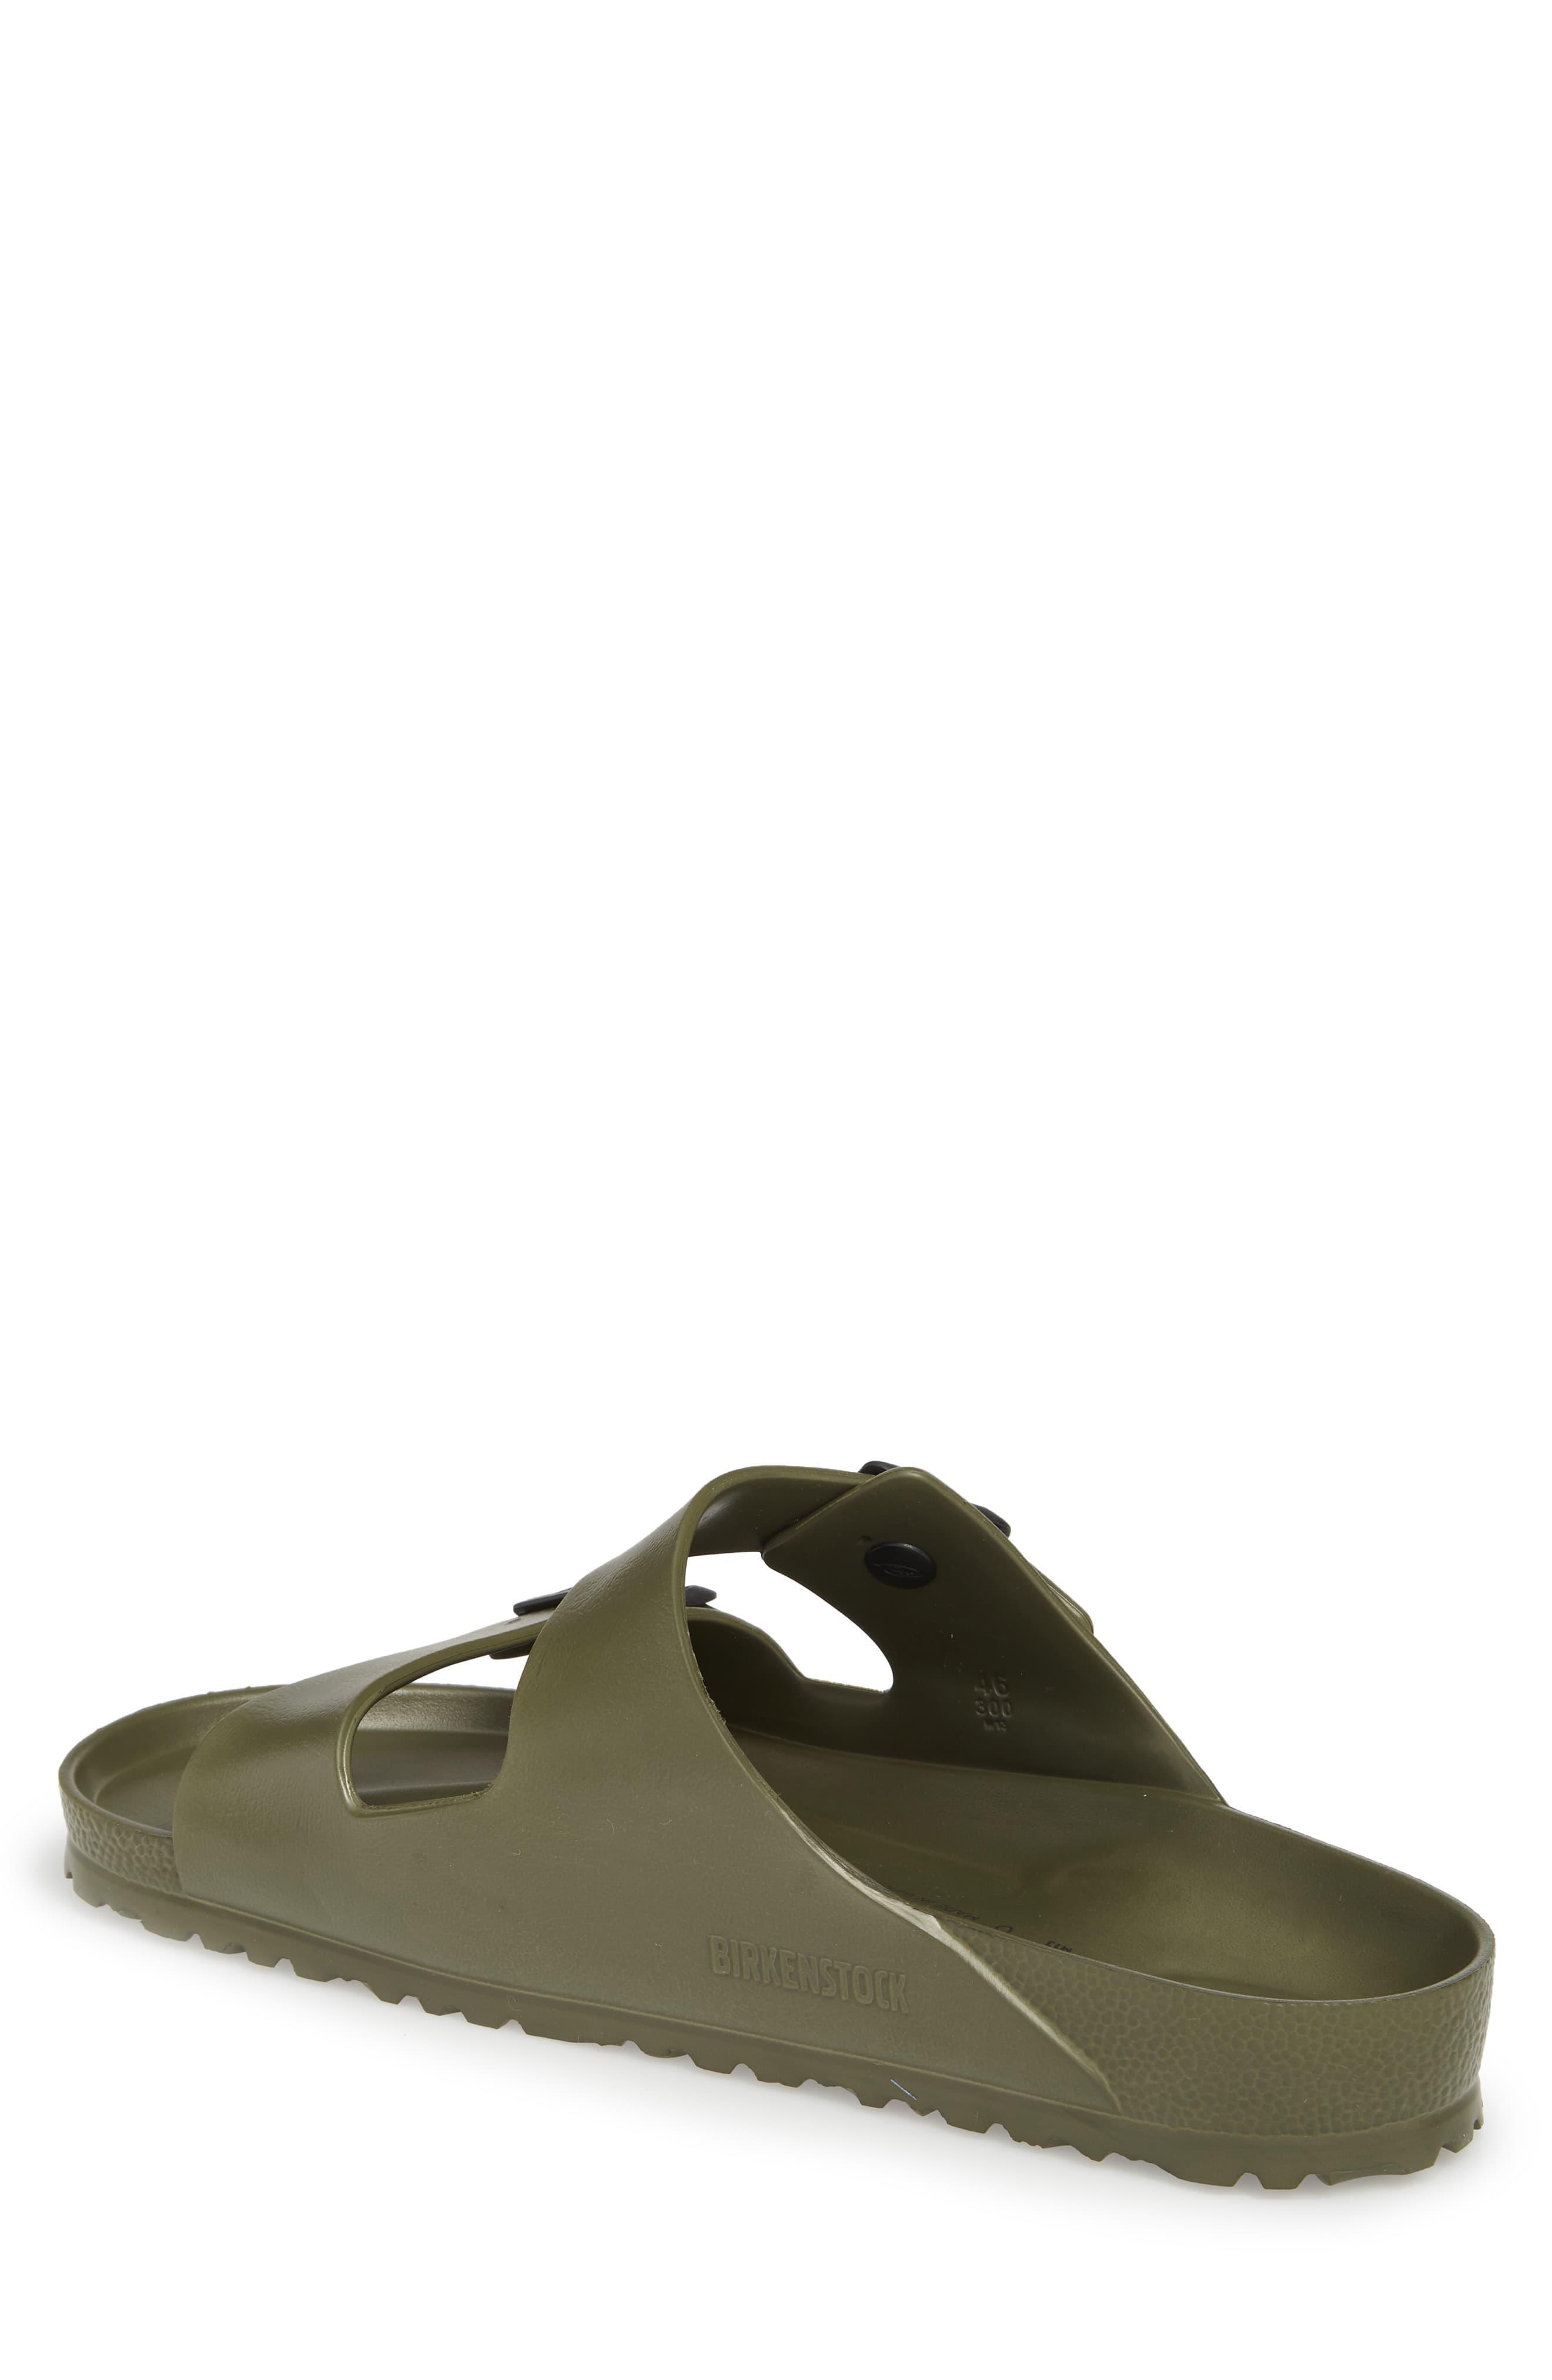 011b70713286b5 Birkenstock Essentials Arizona Eva Waterproof Slide Sandal in Green ...